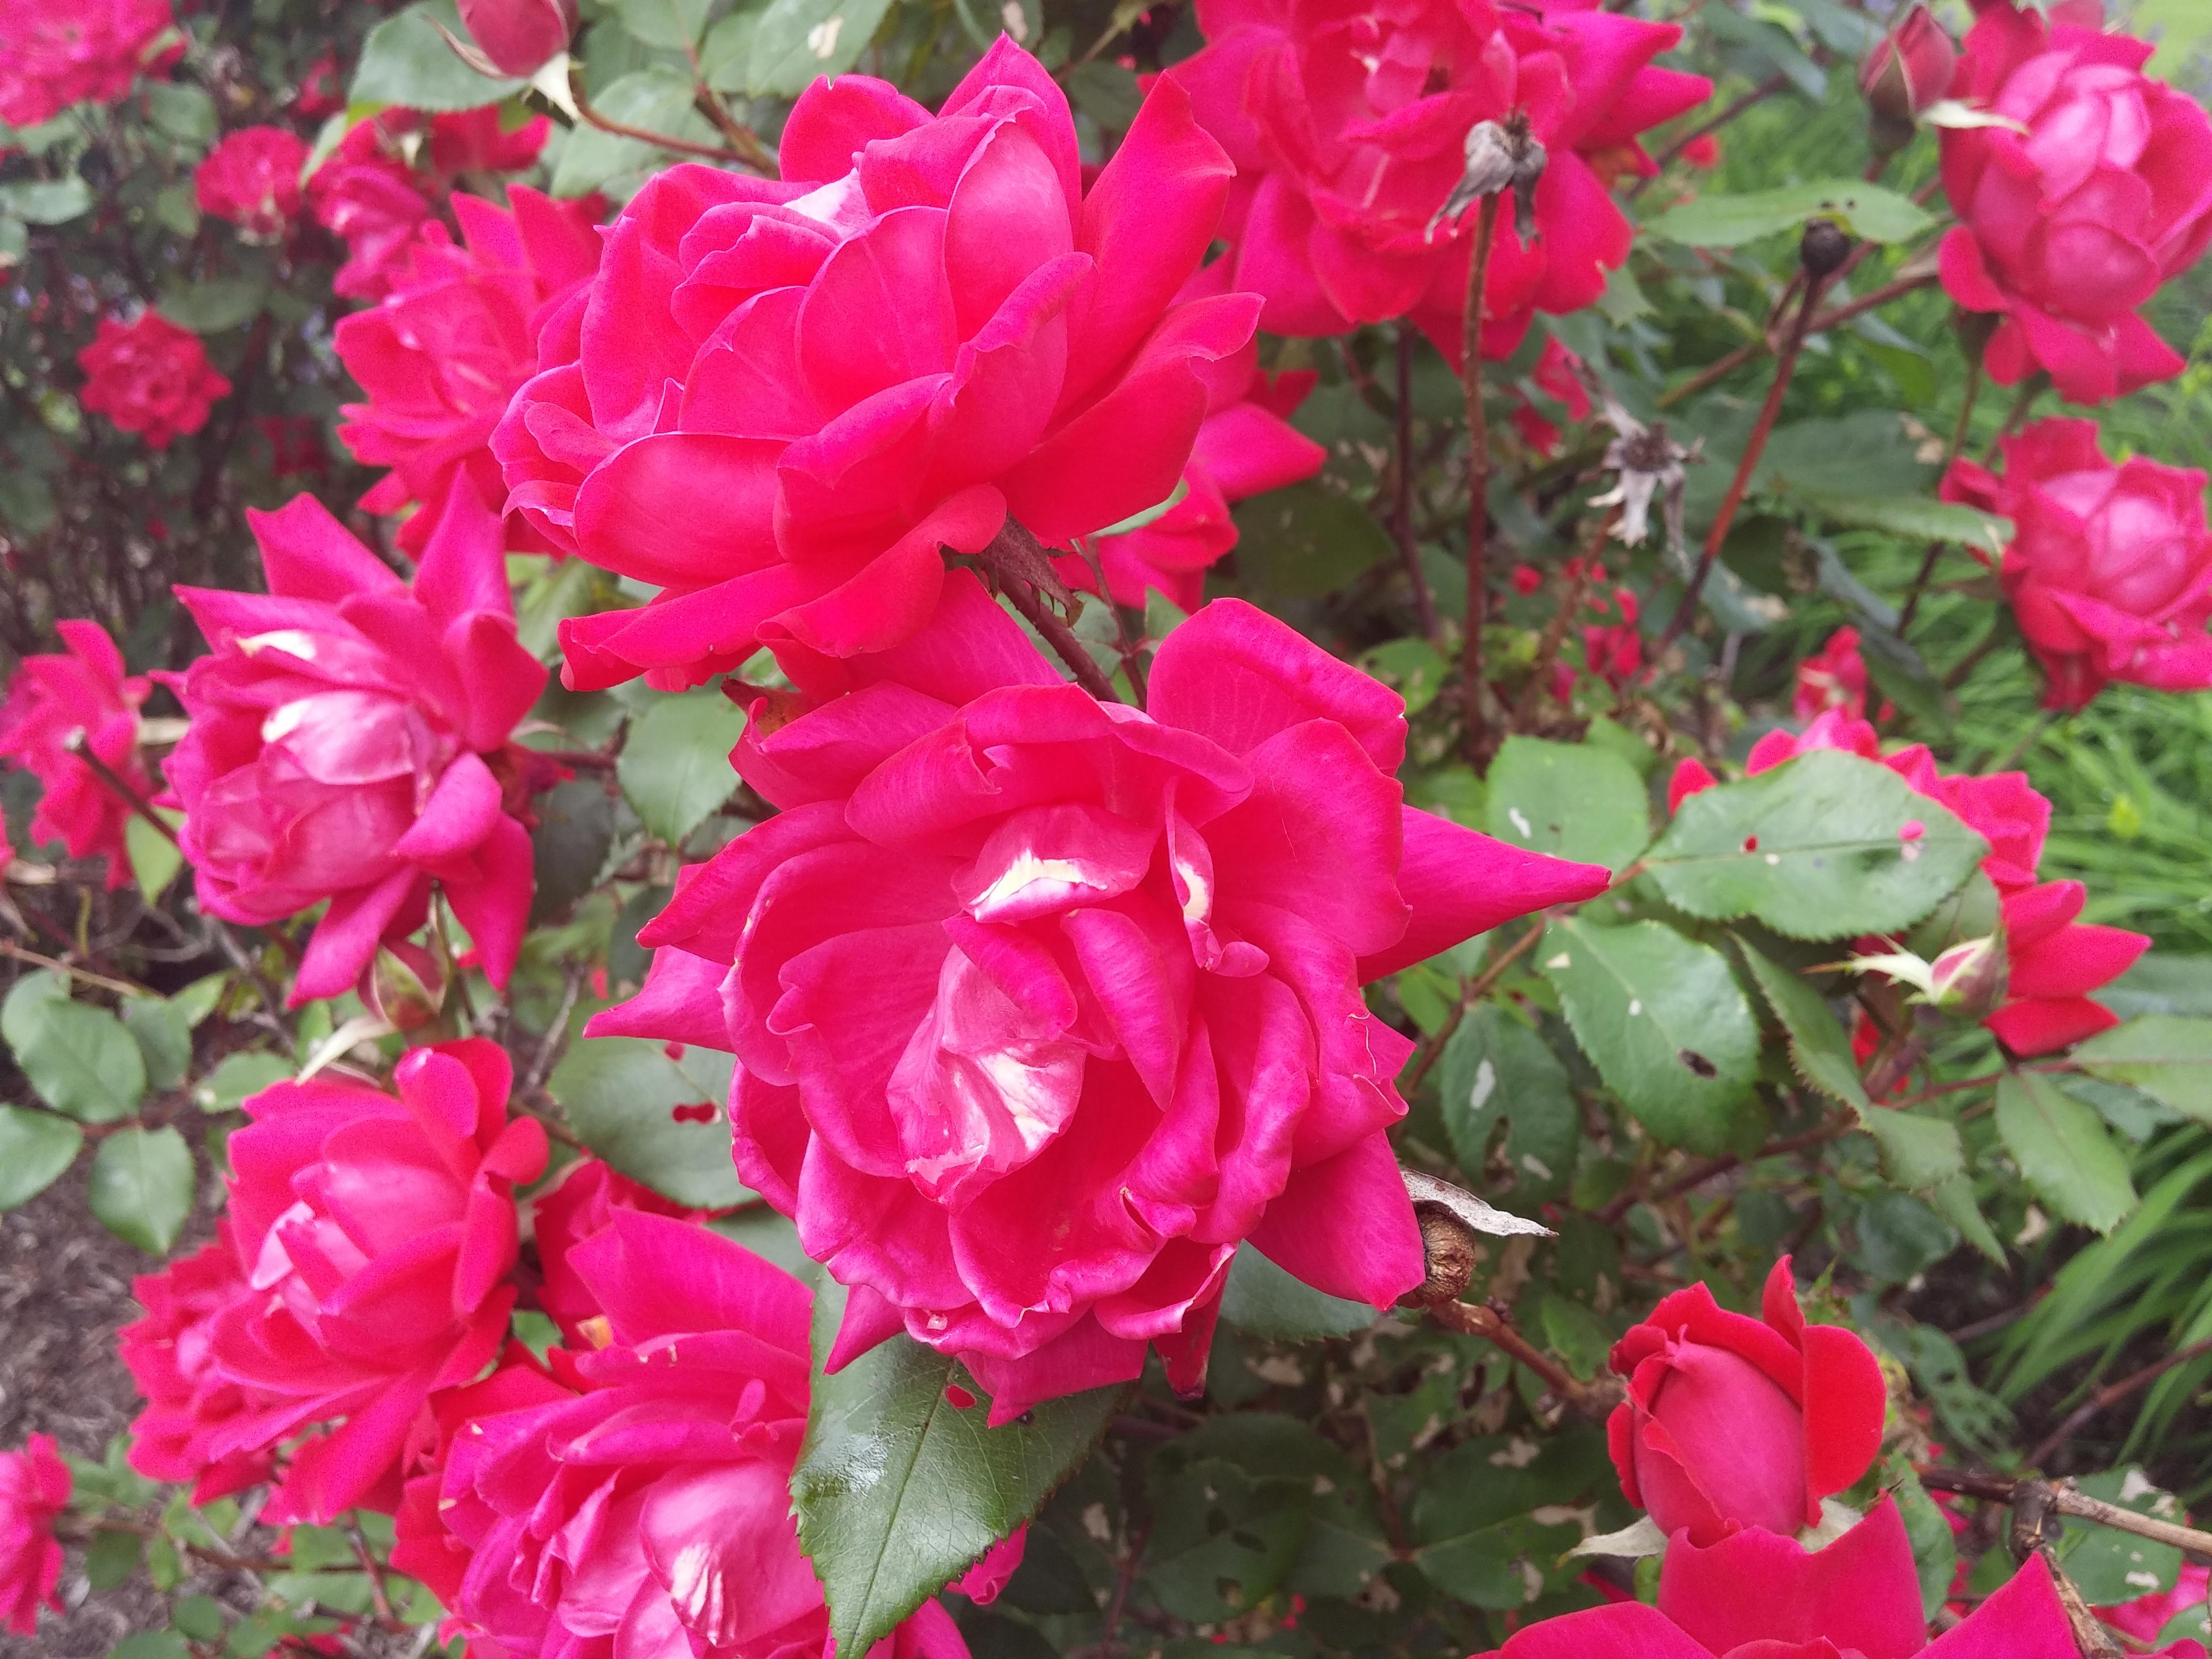 LG G3 rose